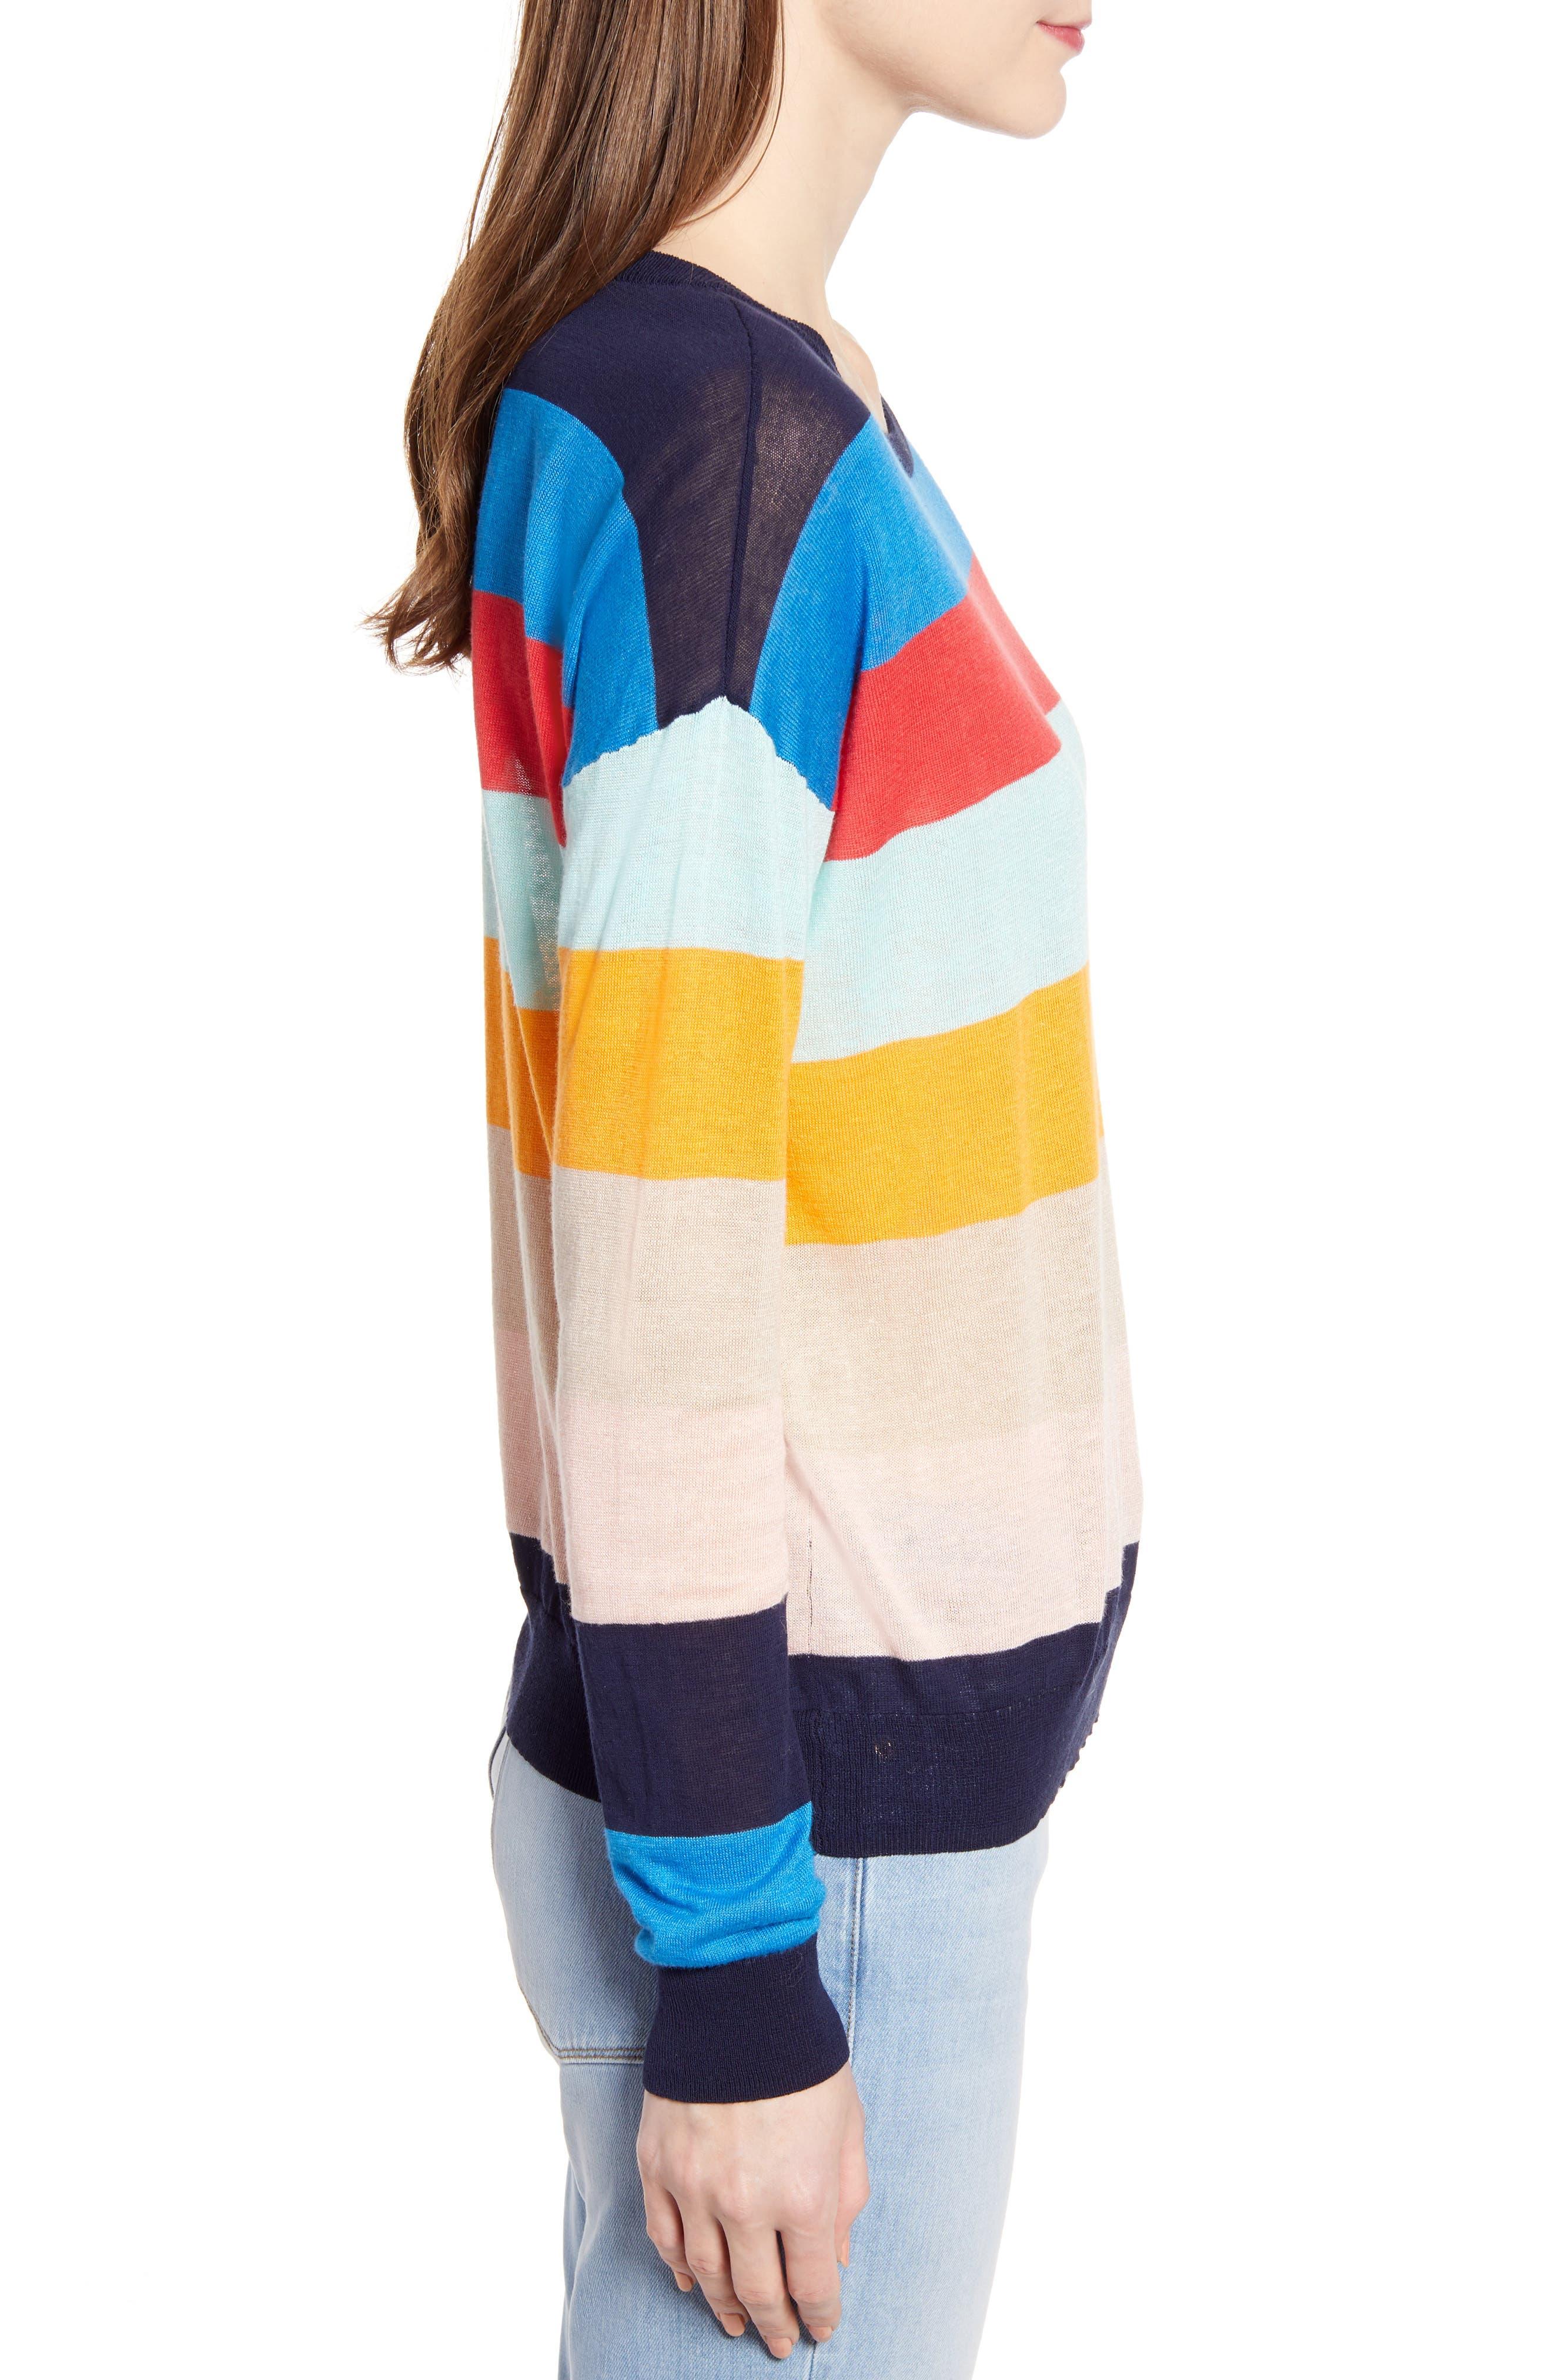 SPLENDID, Sunray Colorblock Sweater, Alternate thumbnail 3, color, BONFIRE MULTI